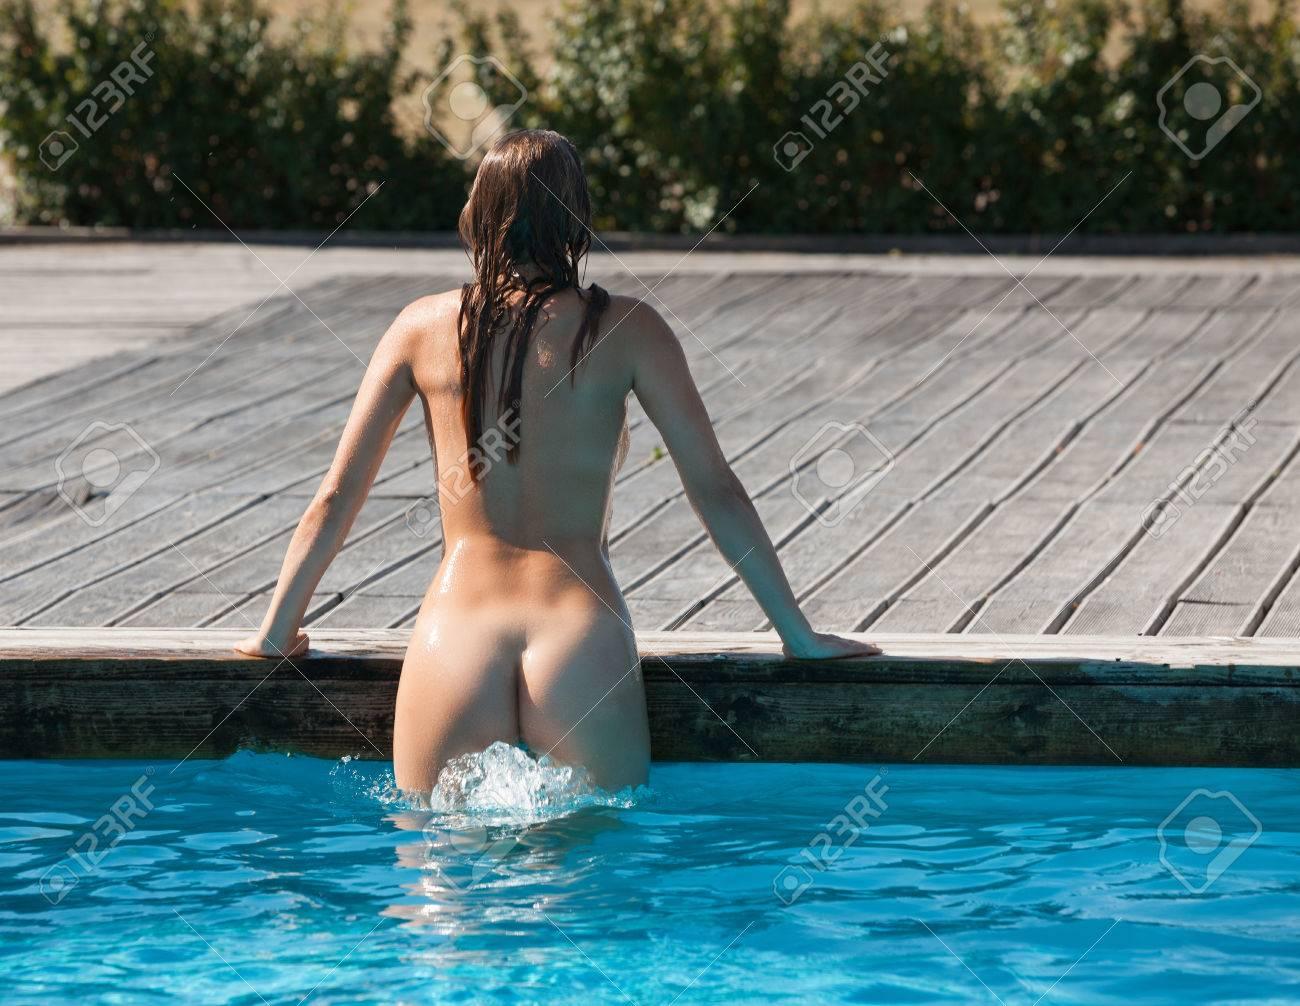 Im swimmbad nackt Nackt Im